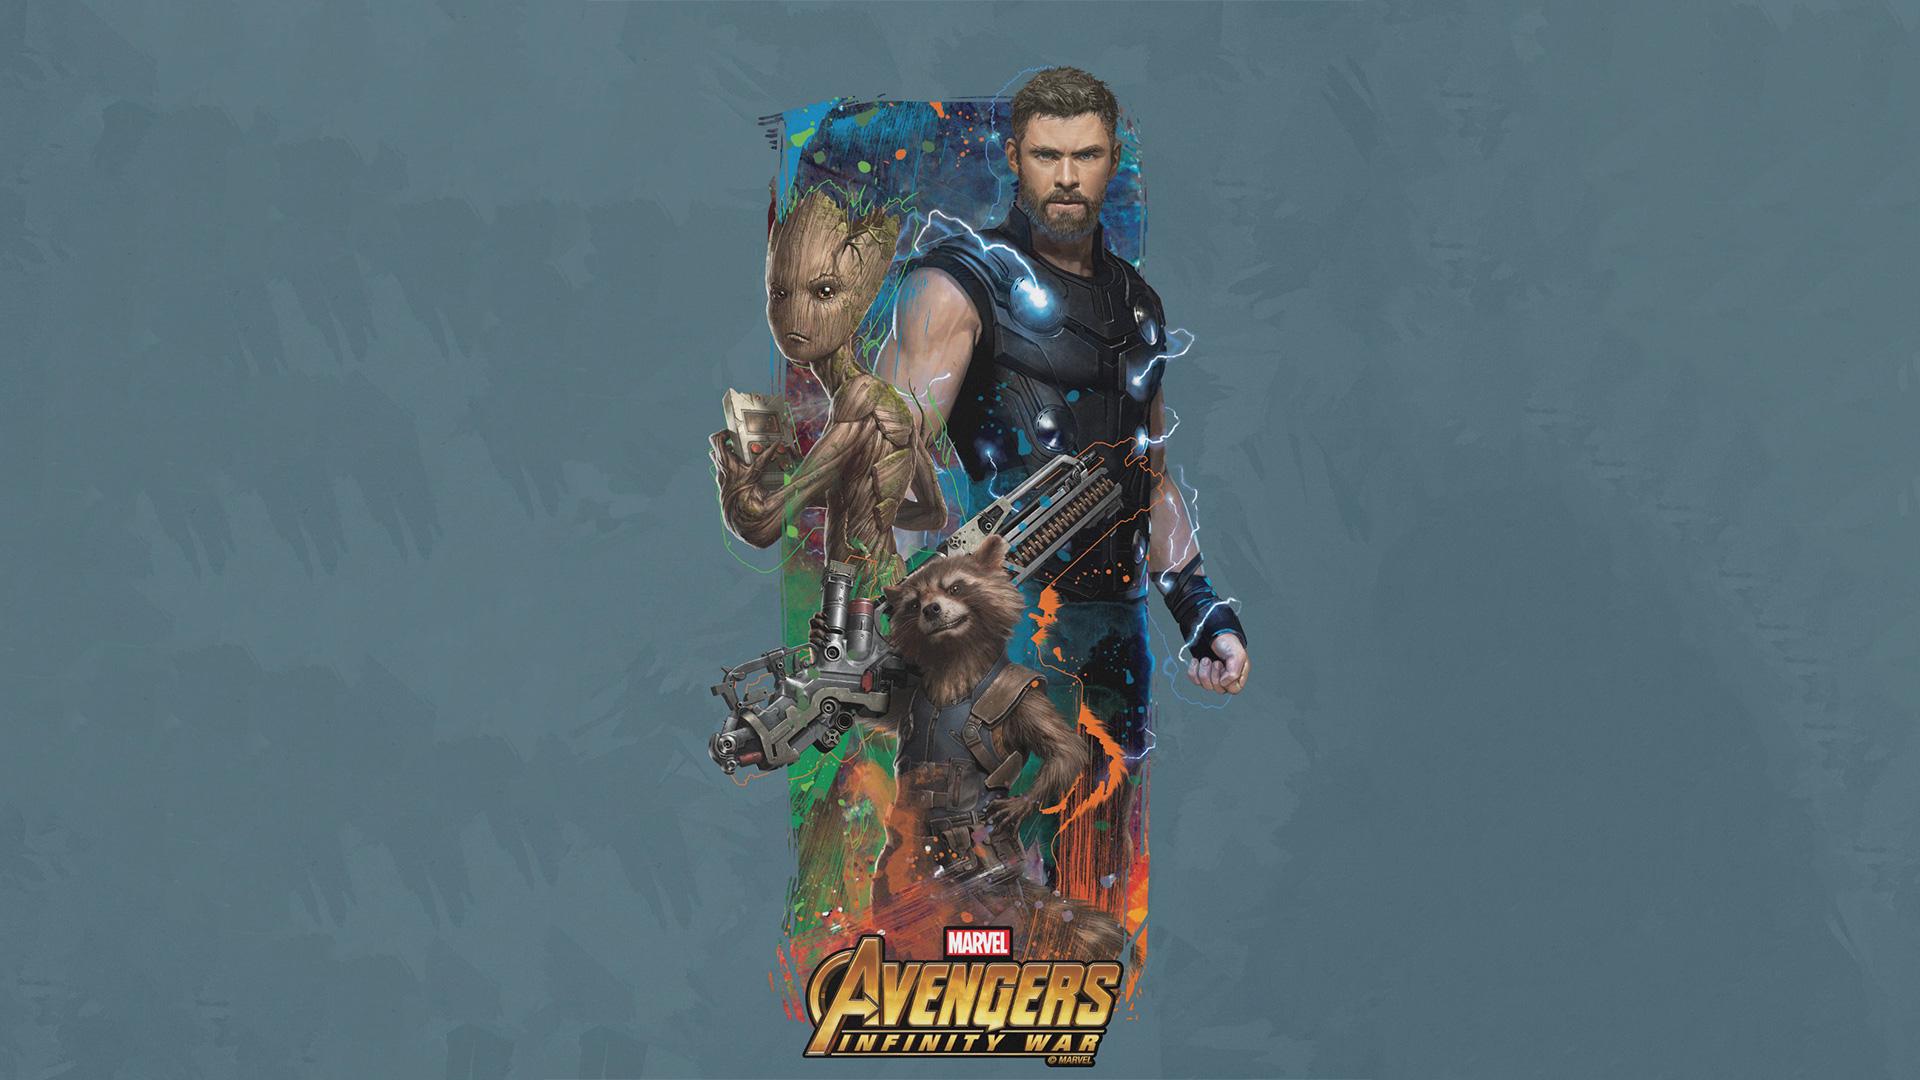 Thor Rocket Groot Avengers Infinity War Artwork